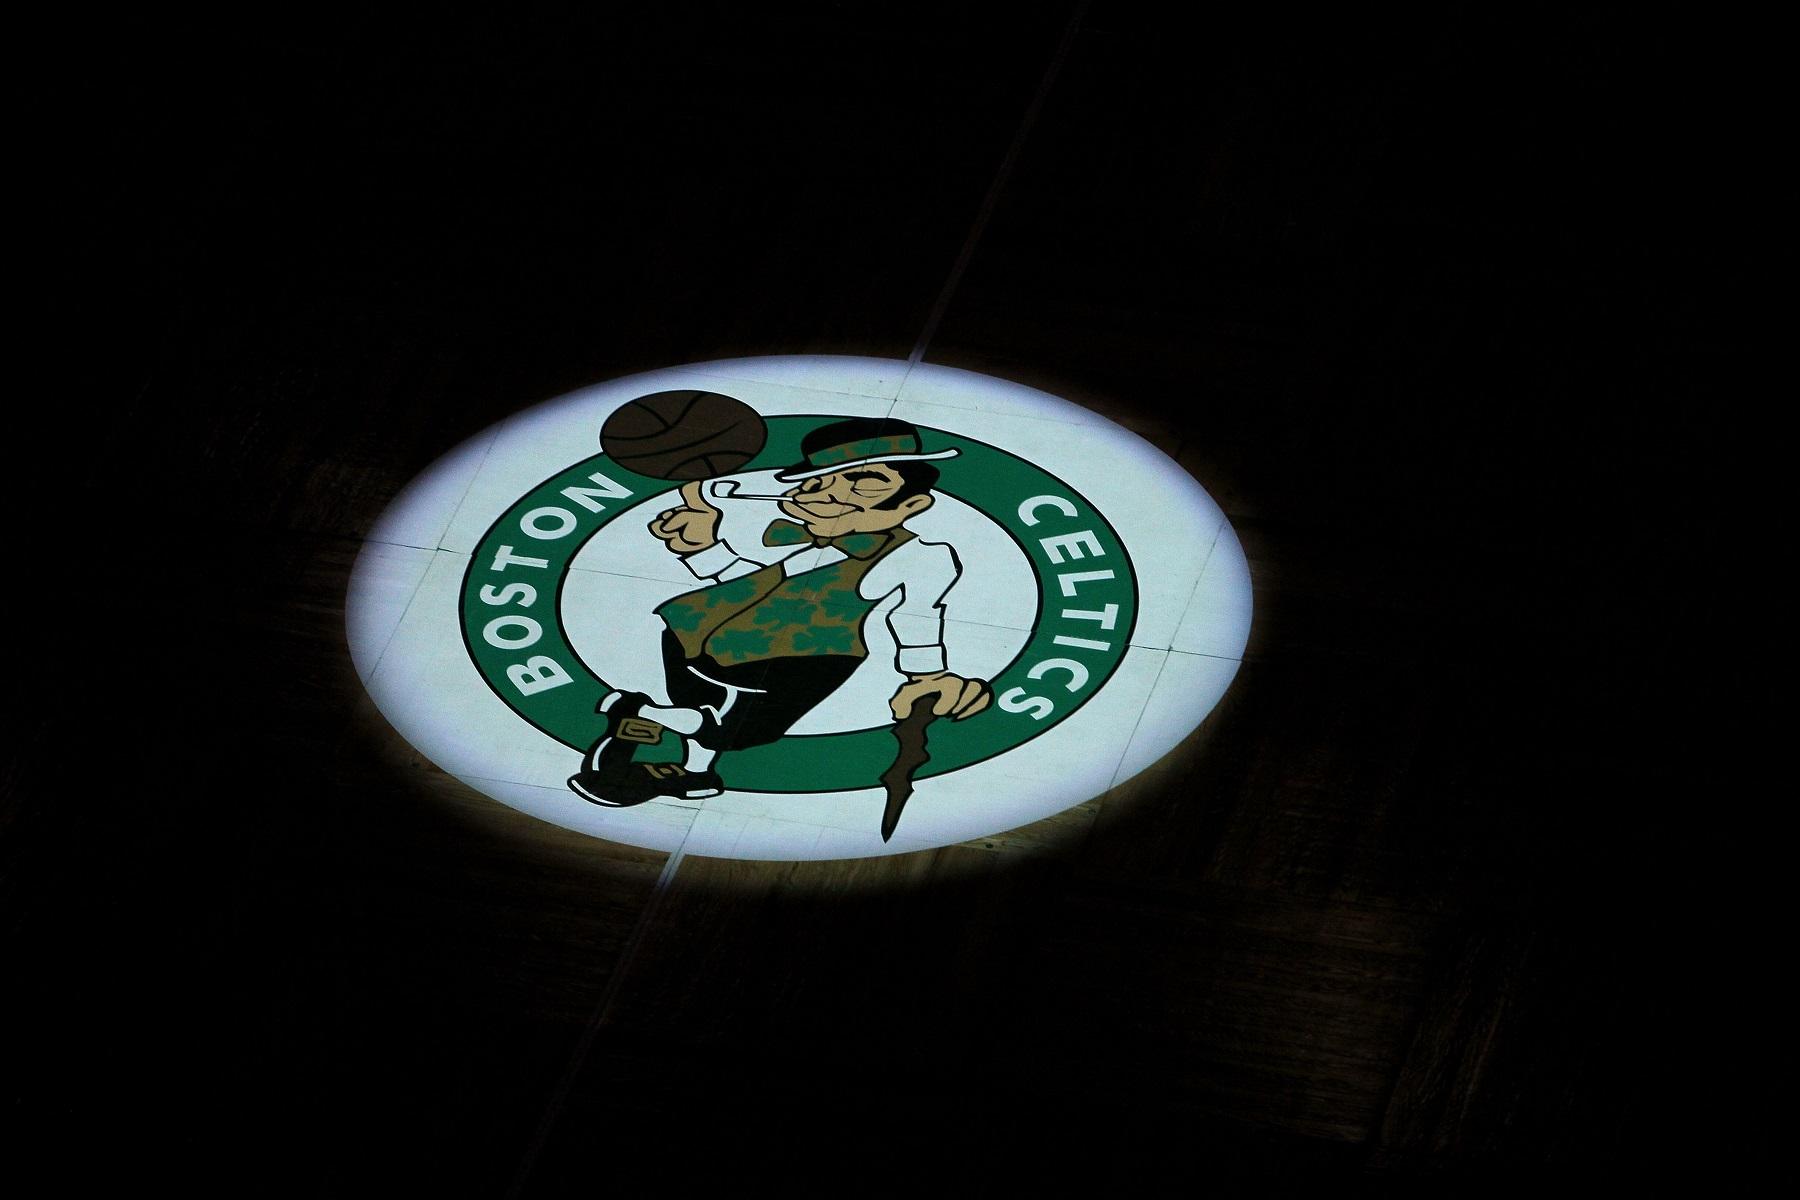 Boston Celtics, NBA draft